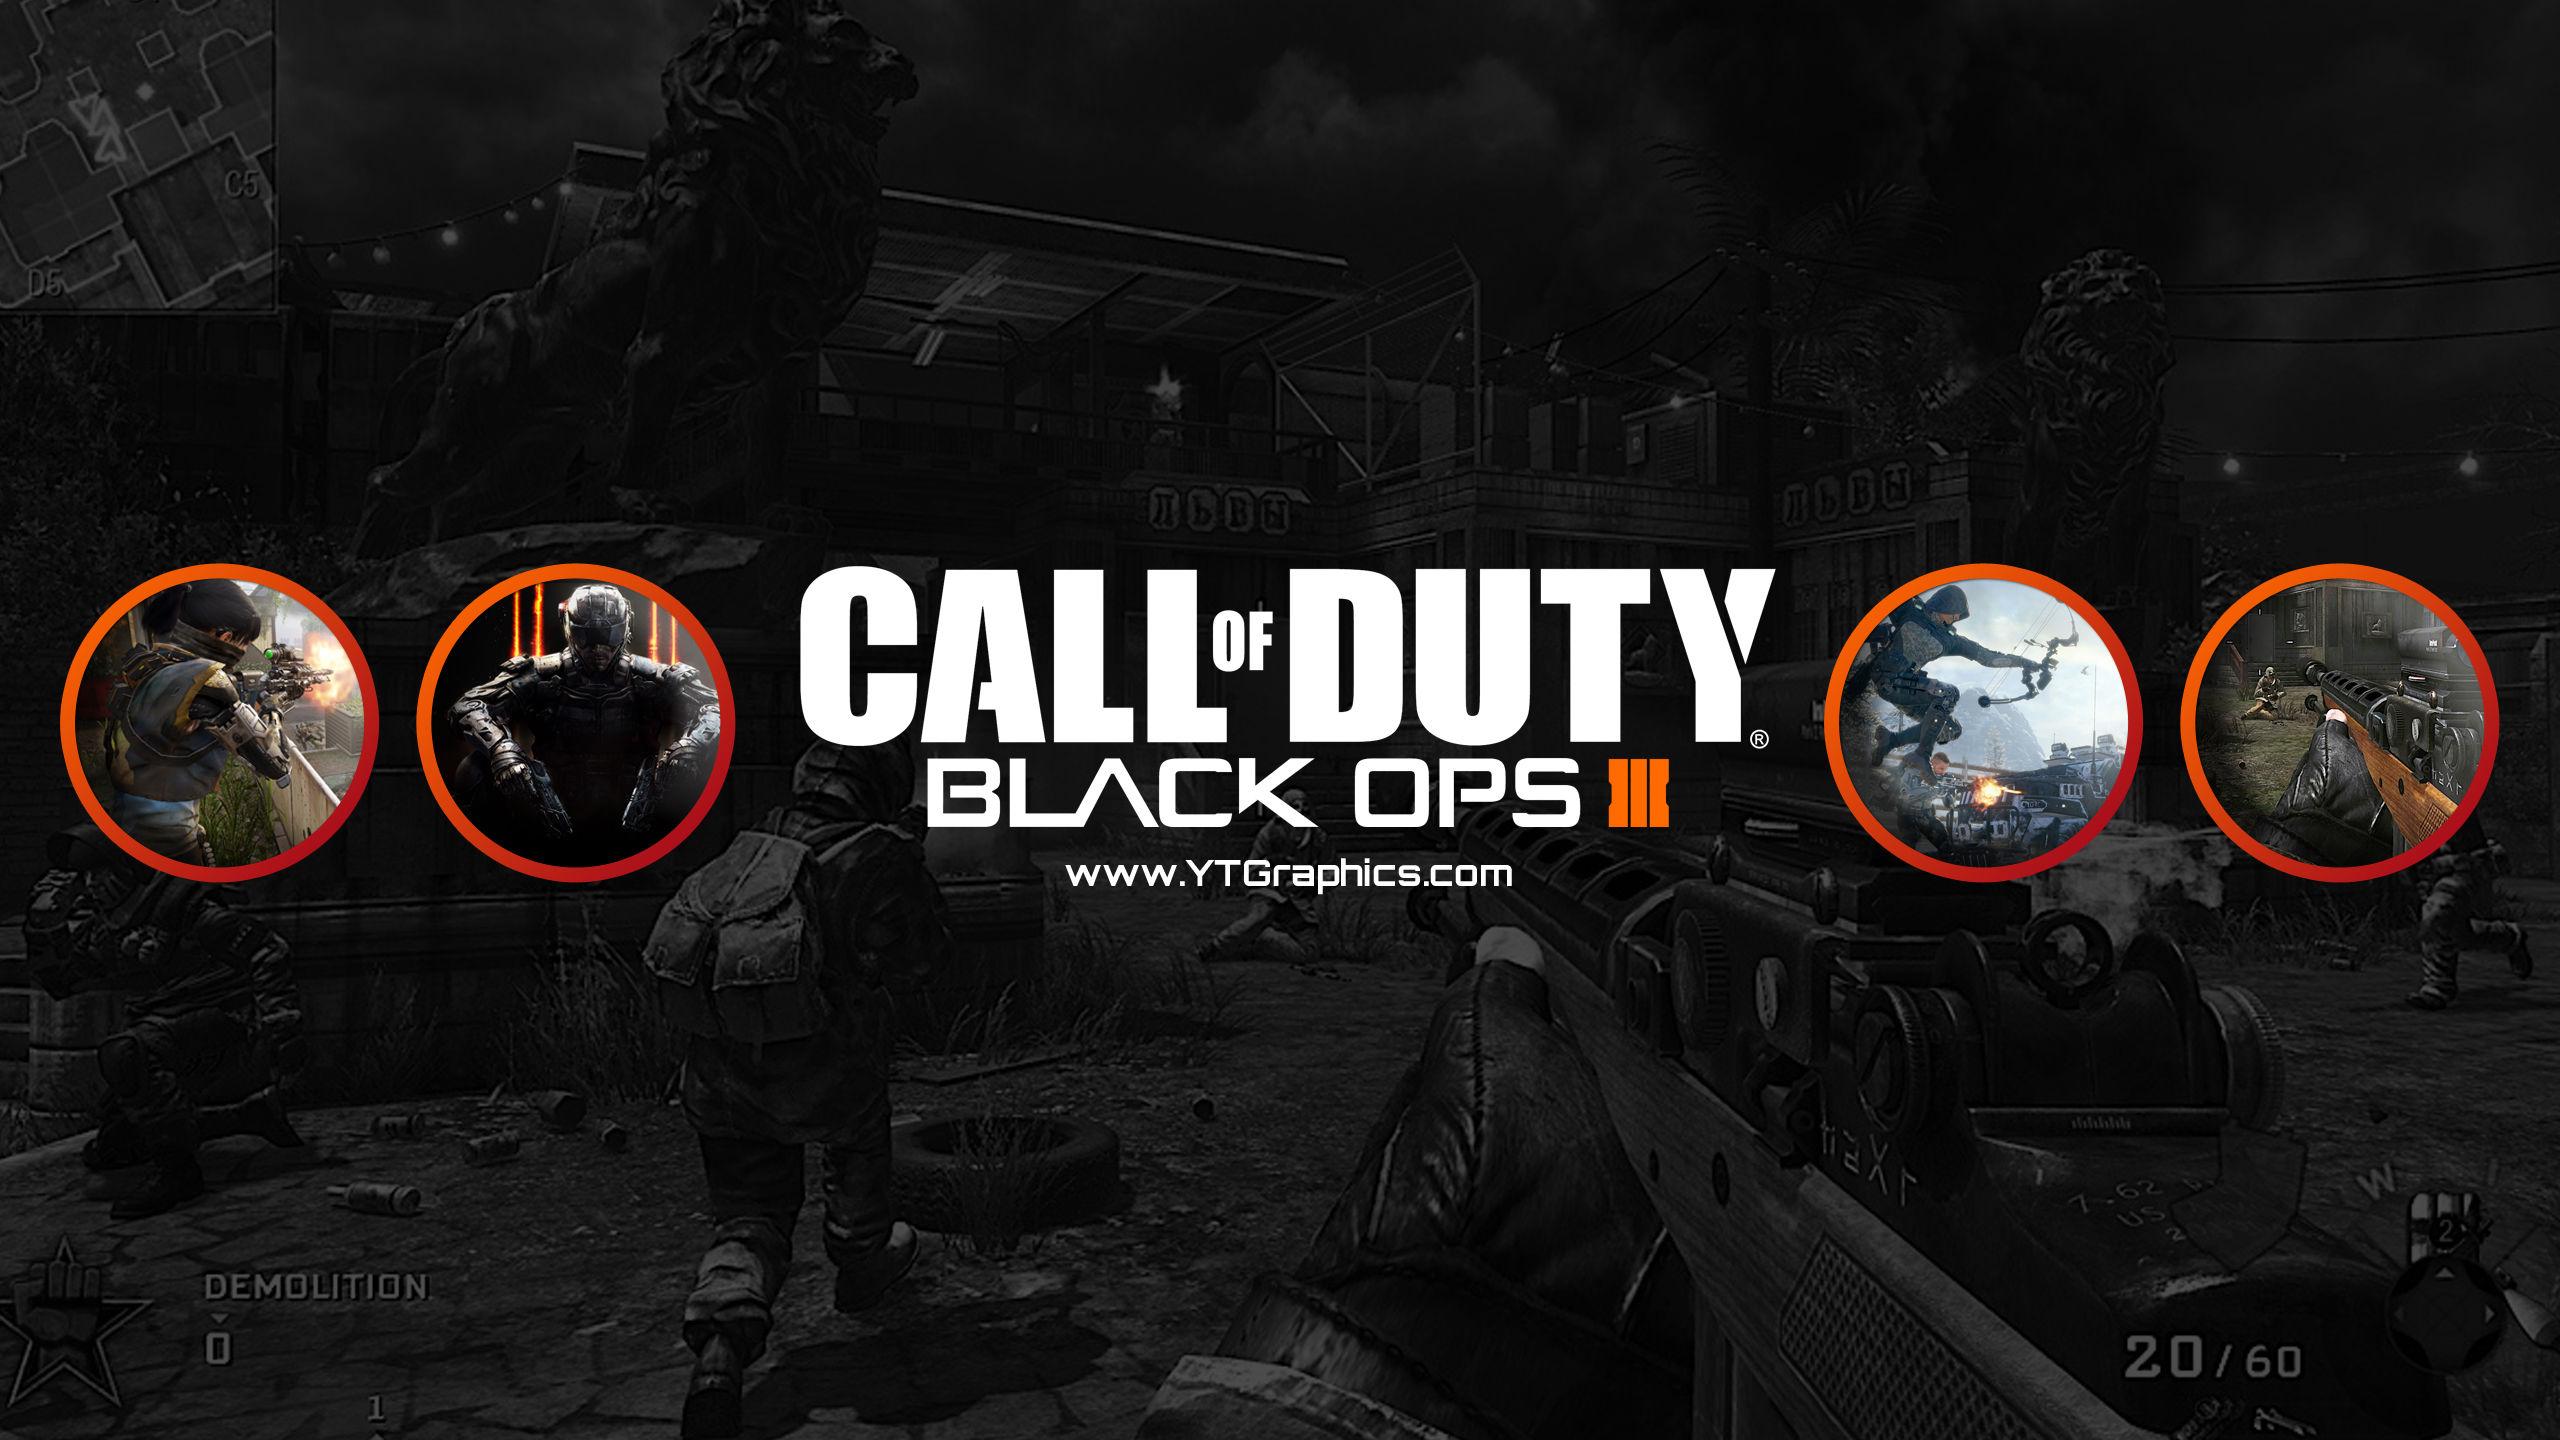 Avatar D Wallpaper Call Of Duty Black Ops Iii Youtube Channel Art Banners